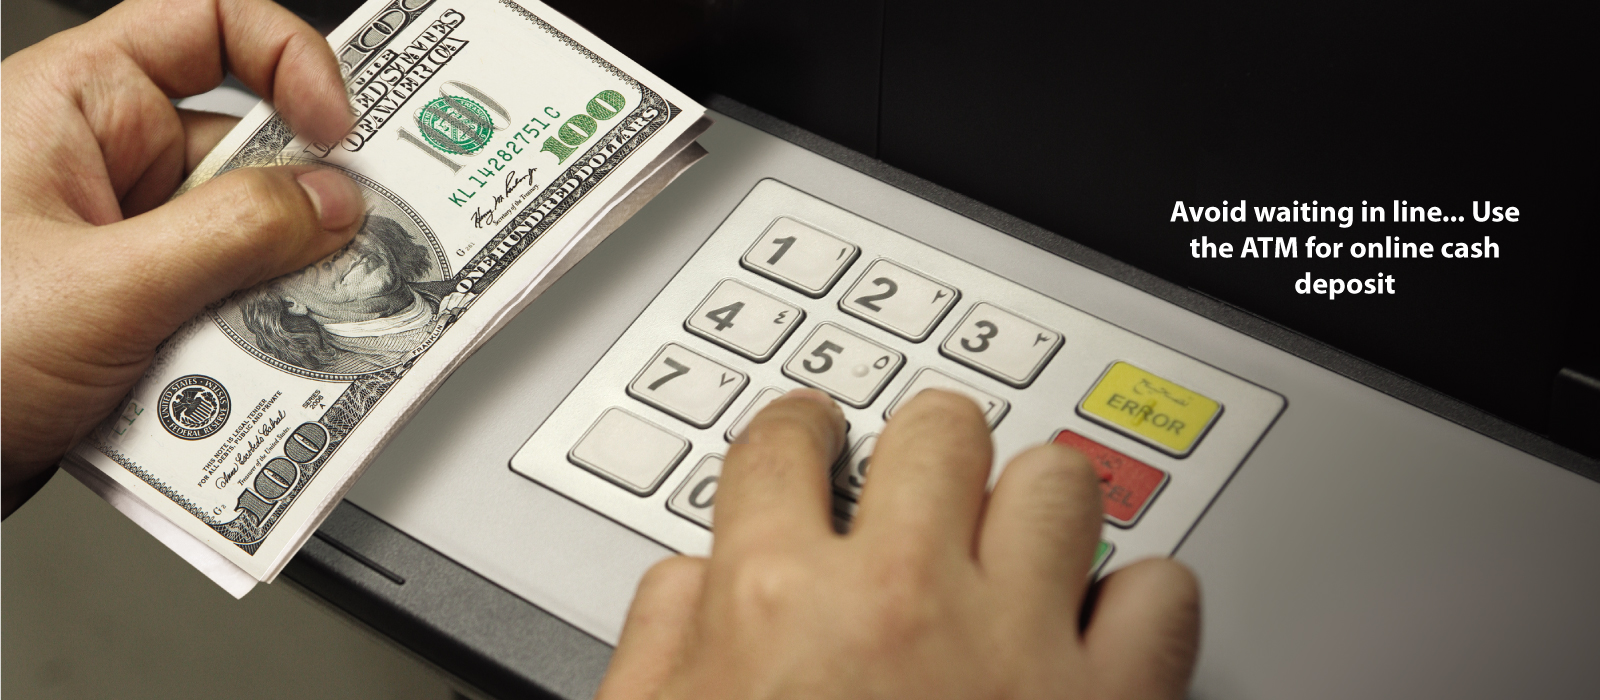 ATM-Cash-Deposit-1600x700-Lebanon-E